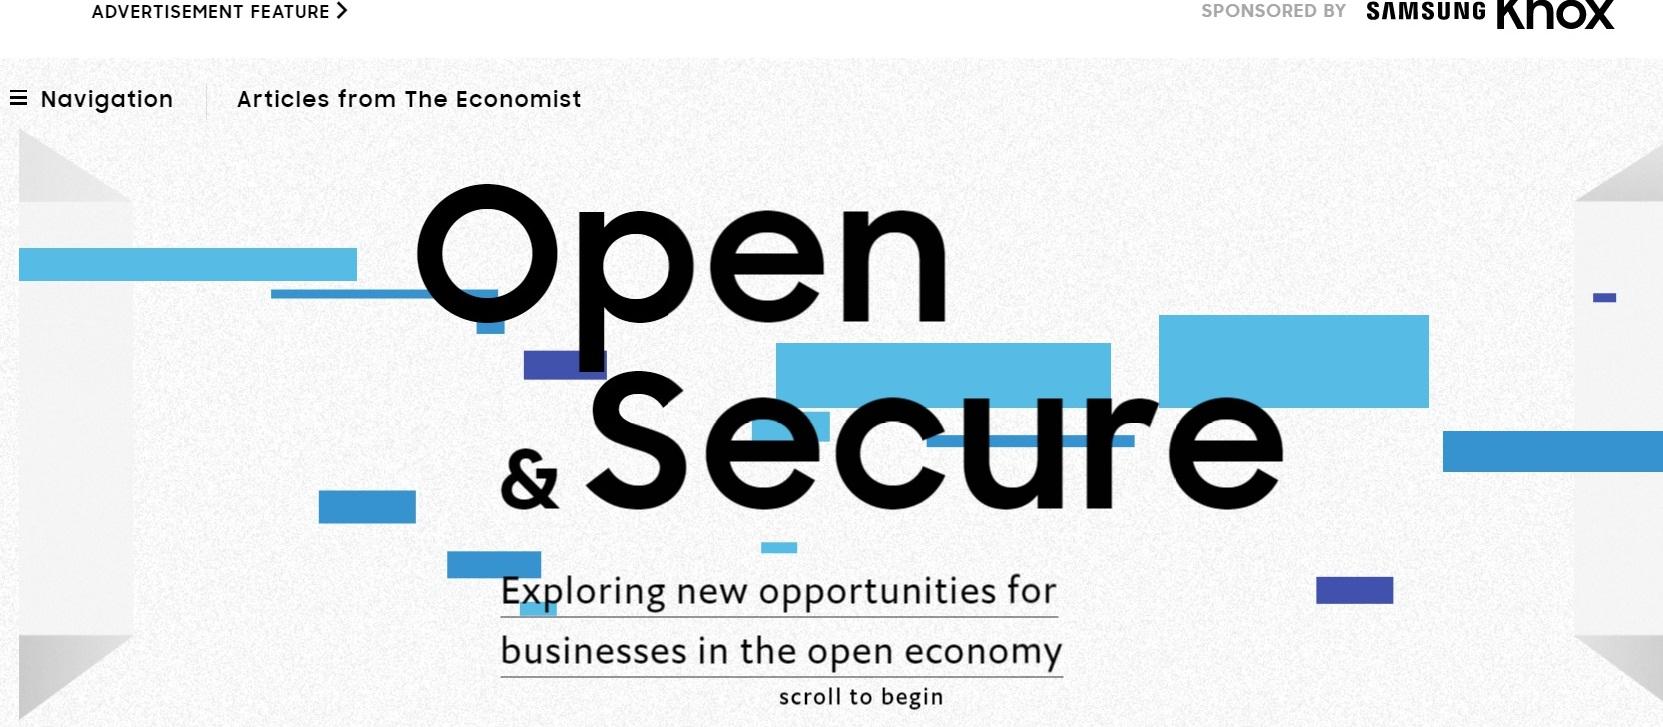 Economist & Samsung Content Project Launched